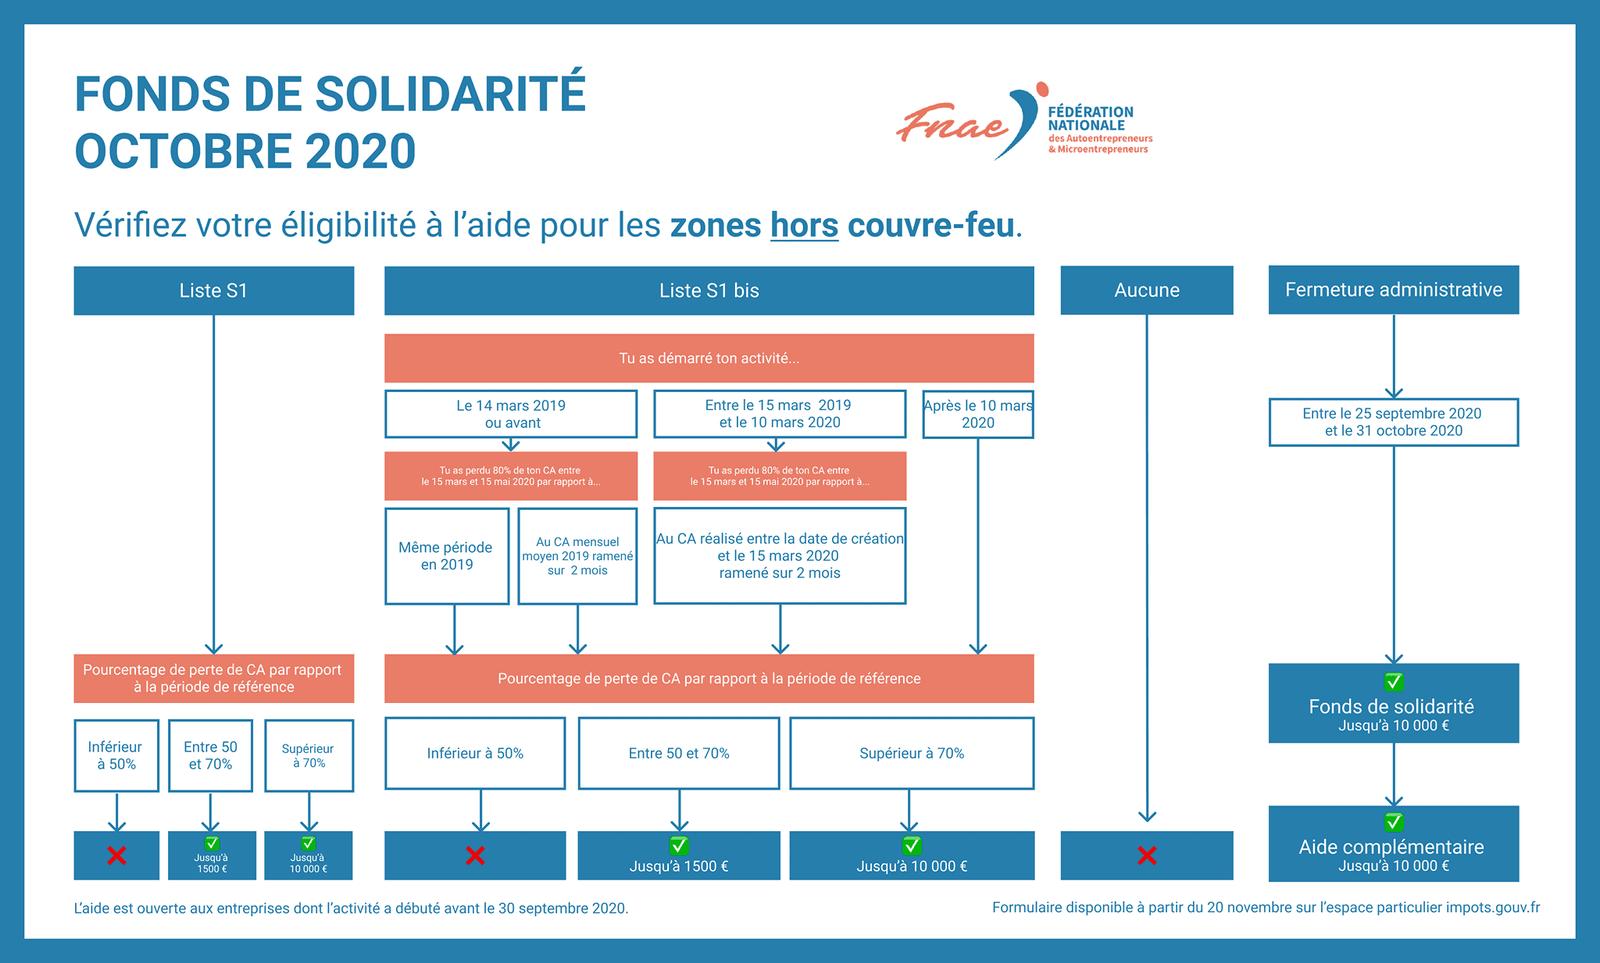 Fonds de solidarité auto entrepreneur octobre 2020 hors couvre feu